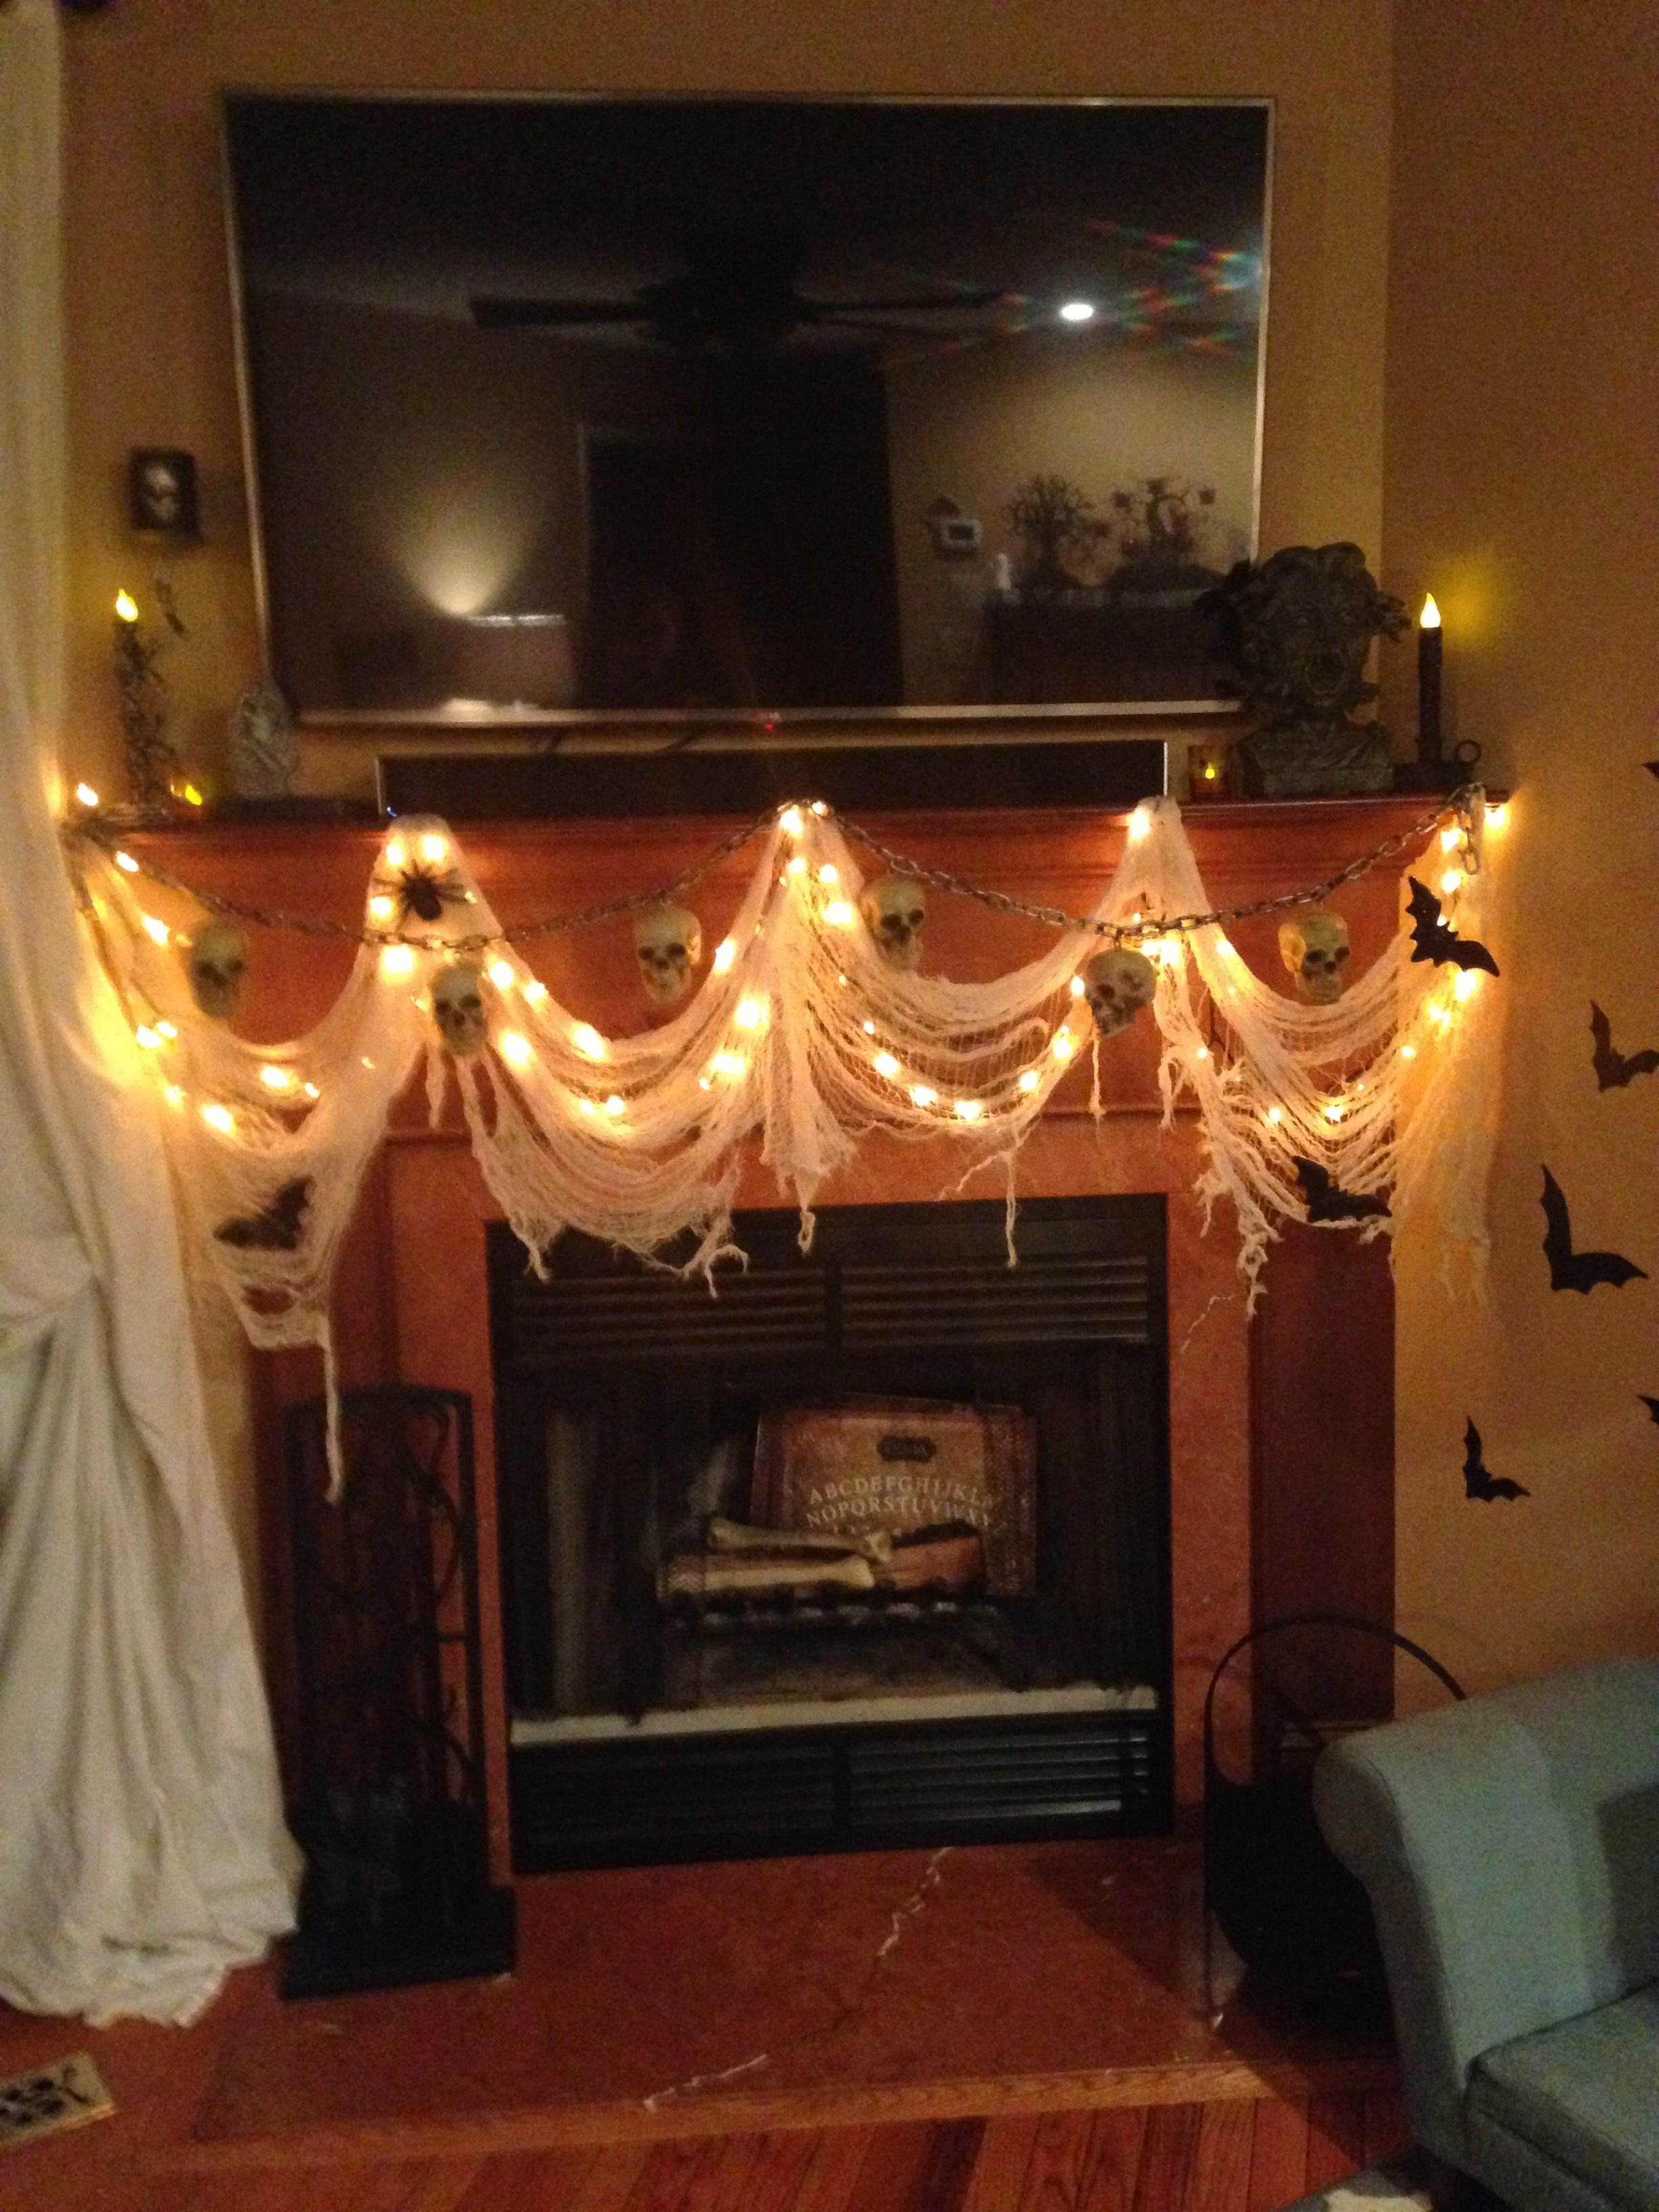 Halloween Fireplace Mantel Halloween Decorations 2016 Halloween Fireplace Fireplace Mantels Fireplace